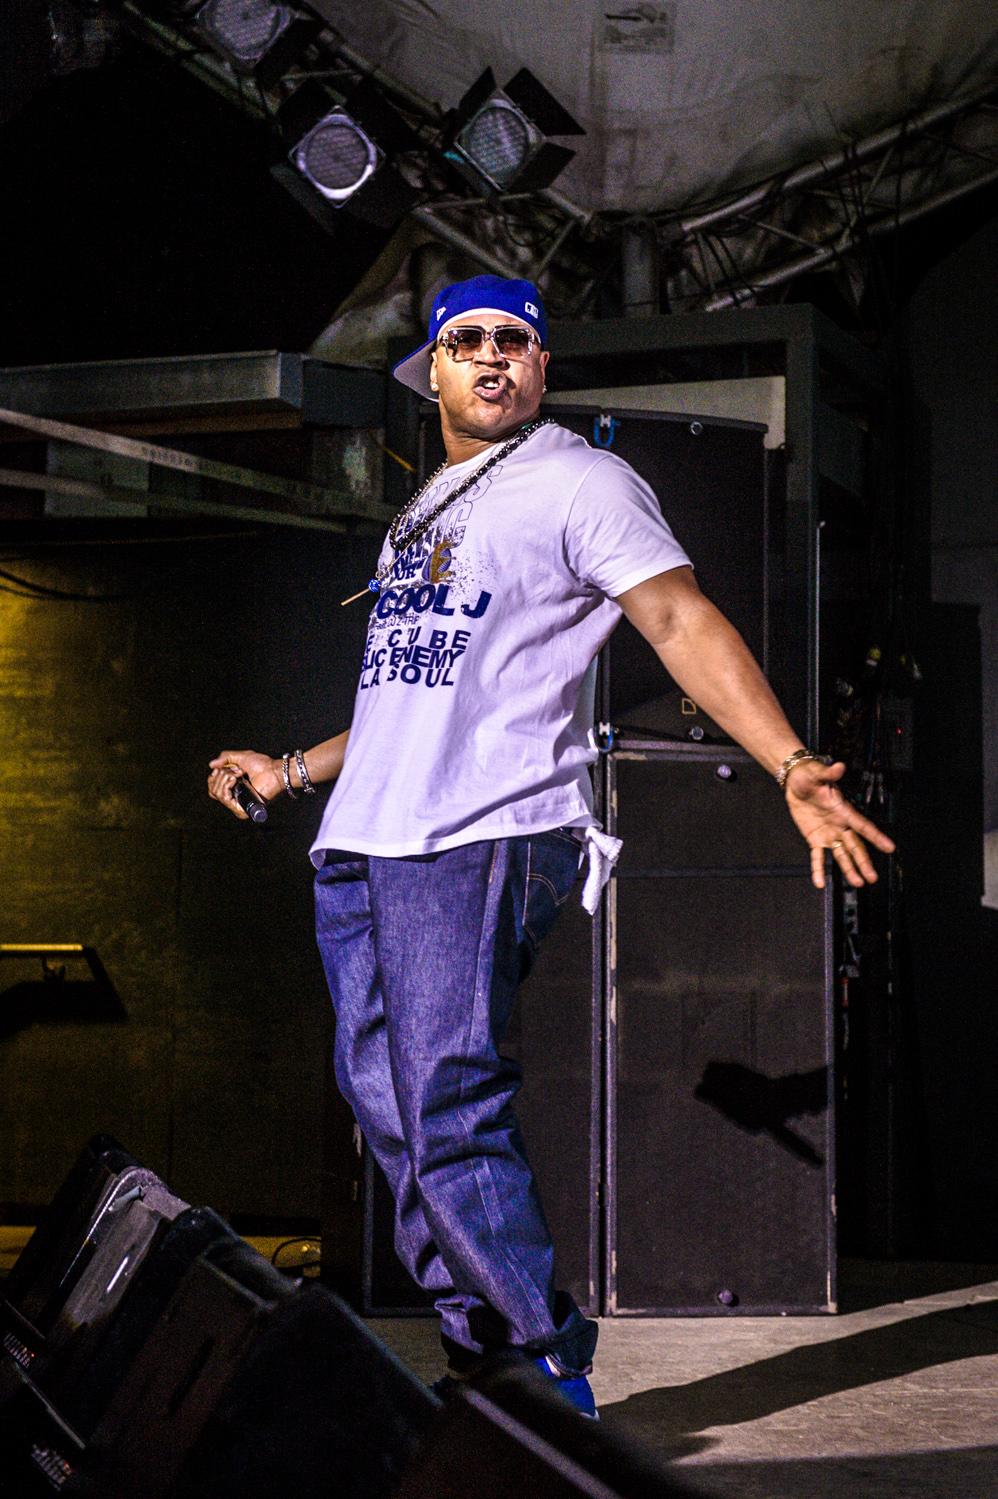 LL Cool J_001_photo_©2013 Steve Dykes.jpg